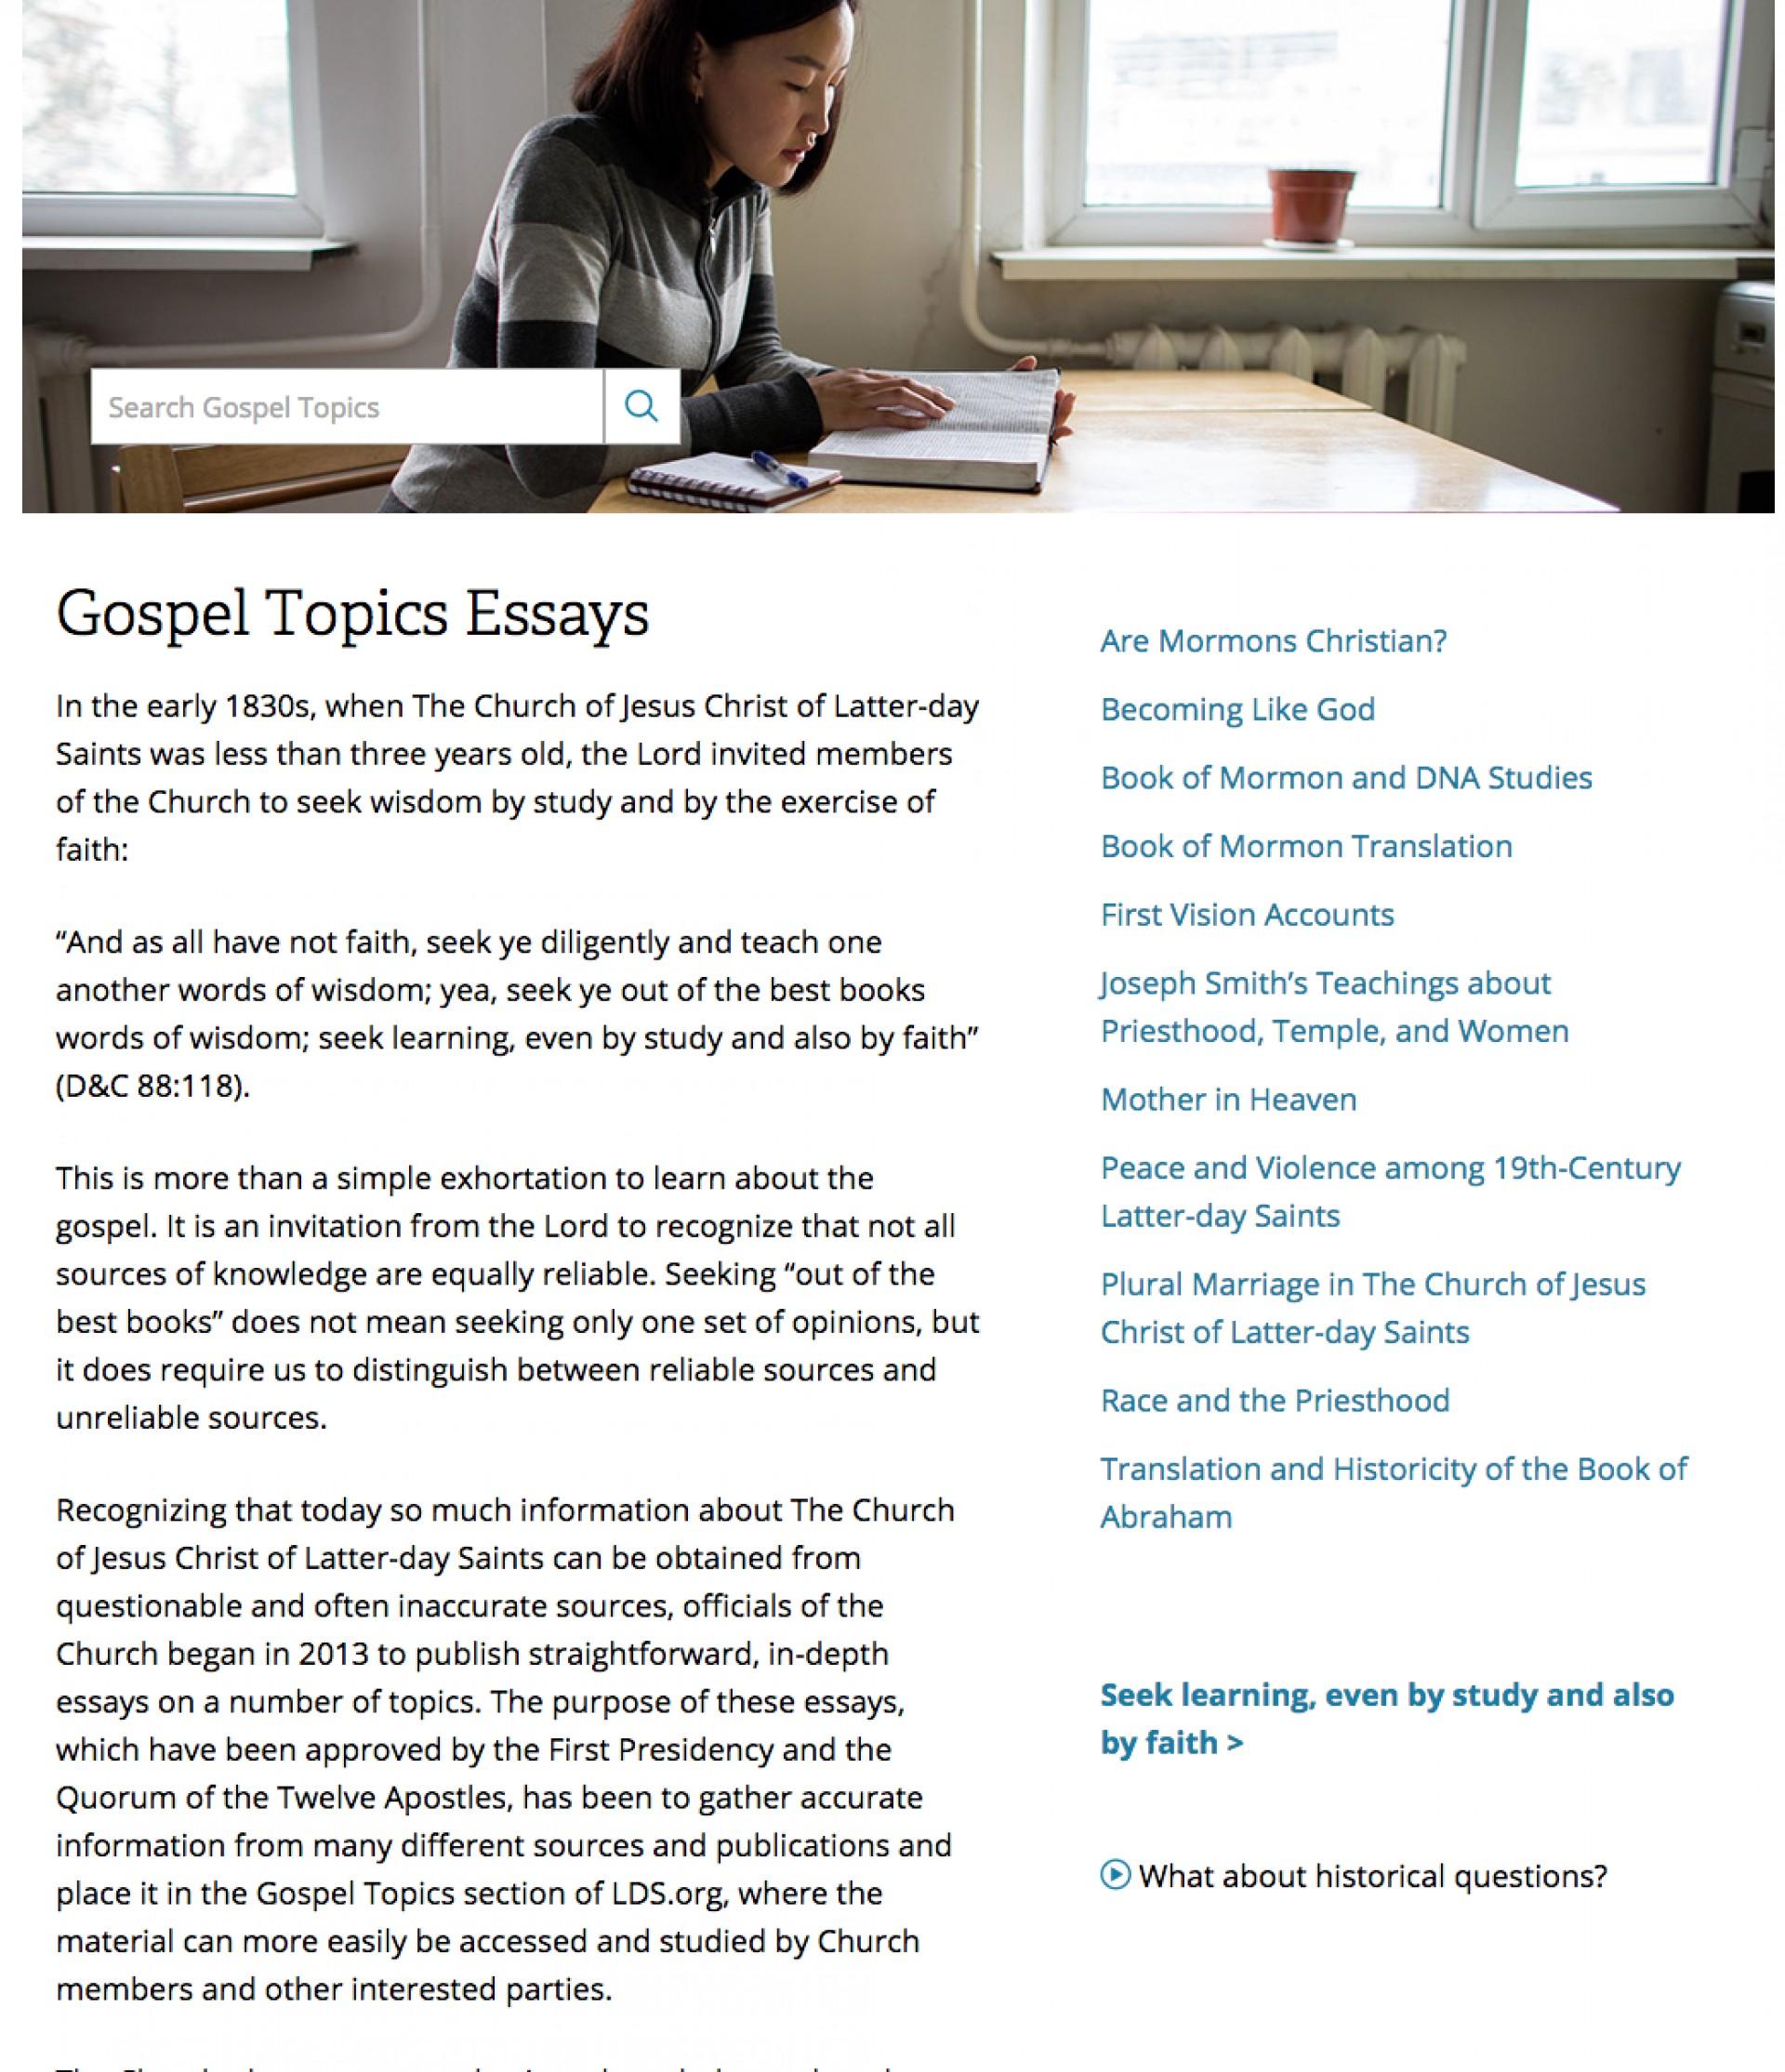 014 Screen20shot202016 1620at208 0920pm Gospel Topics Essays Essay Outstanding Book Of Abraham Pdf Mormon Translation 1920